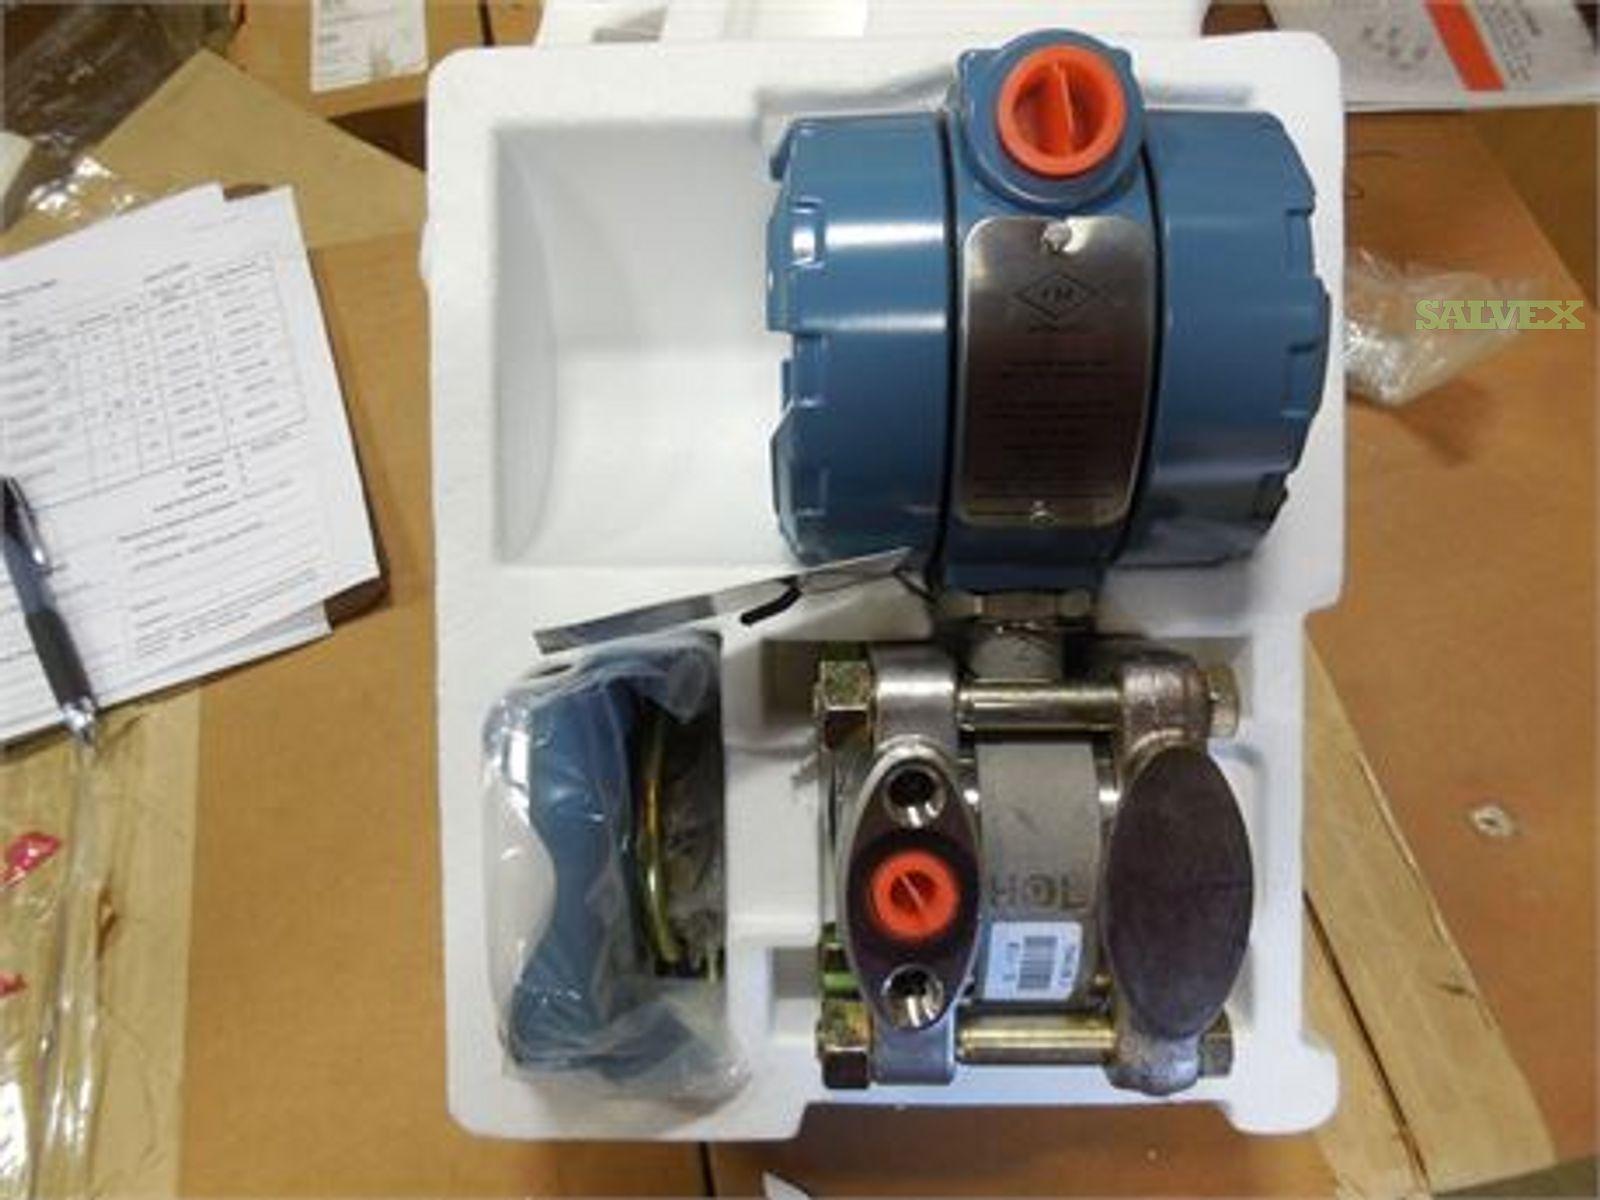 Rosemount Pipe Mount Pressure Gauge Transmitter 0-750 IN. H20 - New (1 Unit)